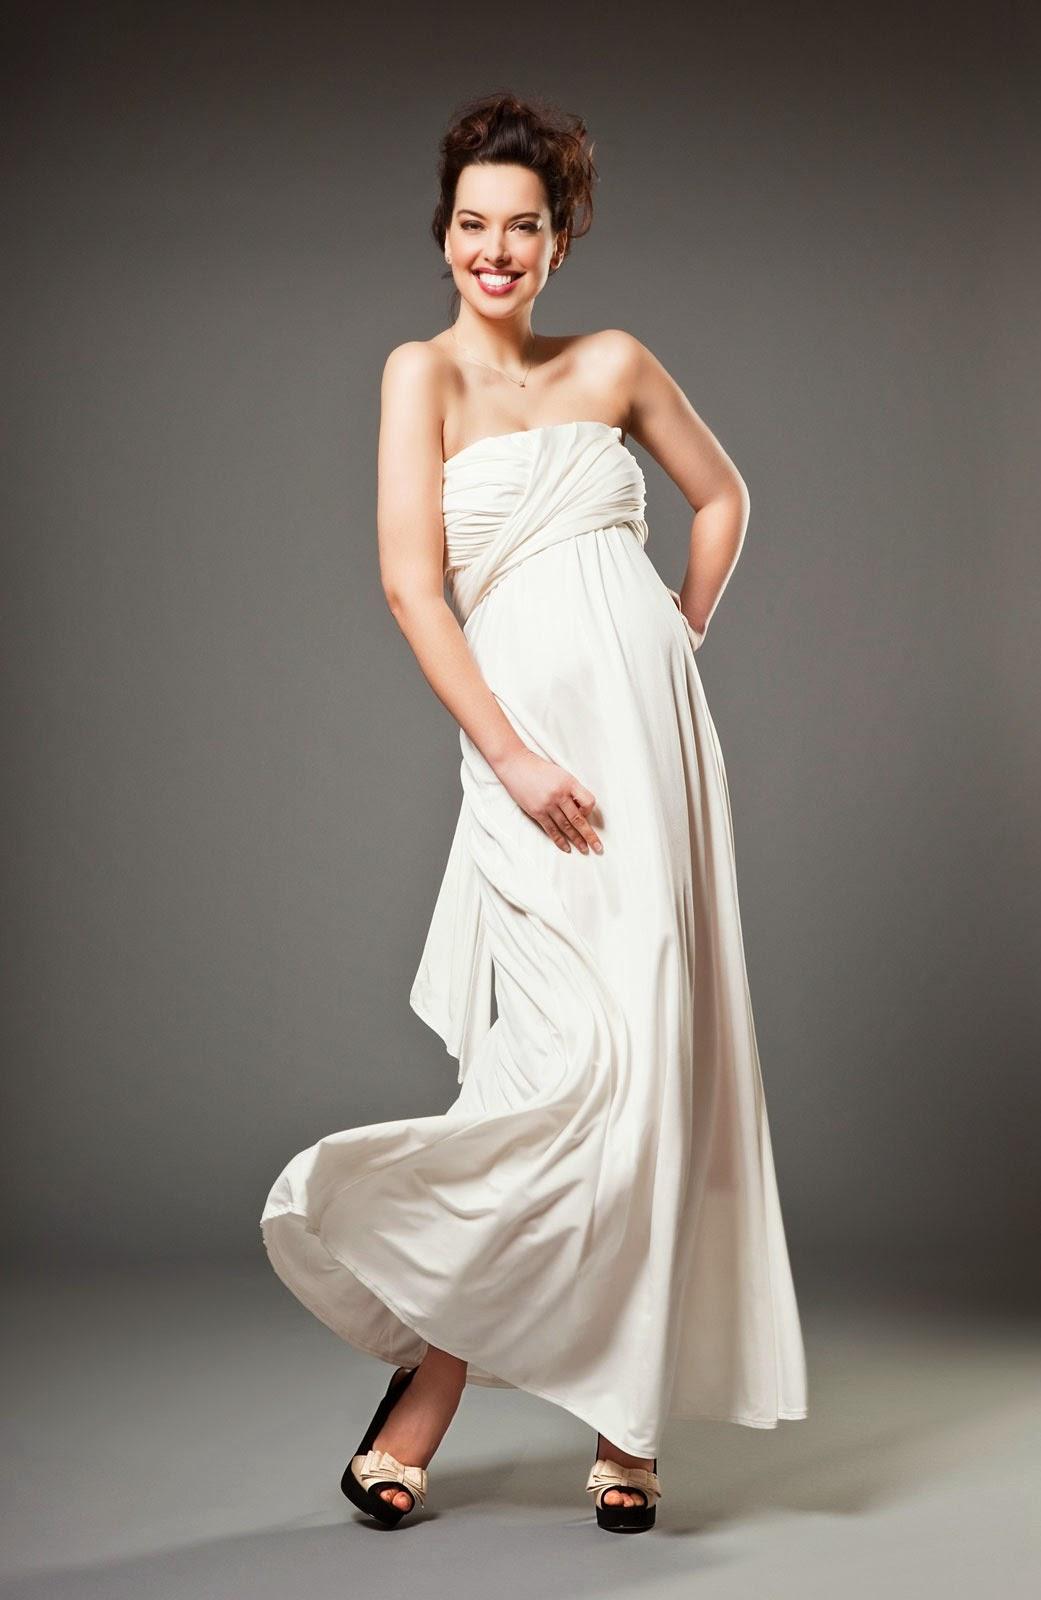 Davids bridal style maternity wedding dresses ideas ombrellifo Images